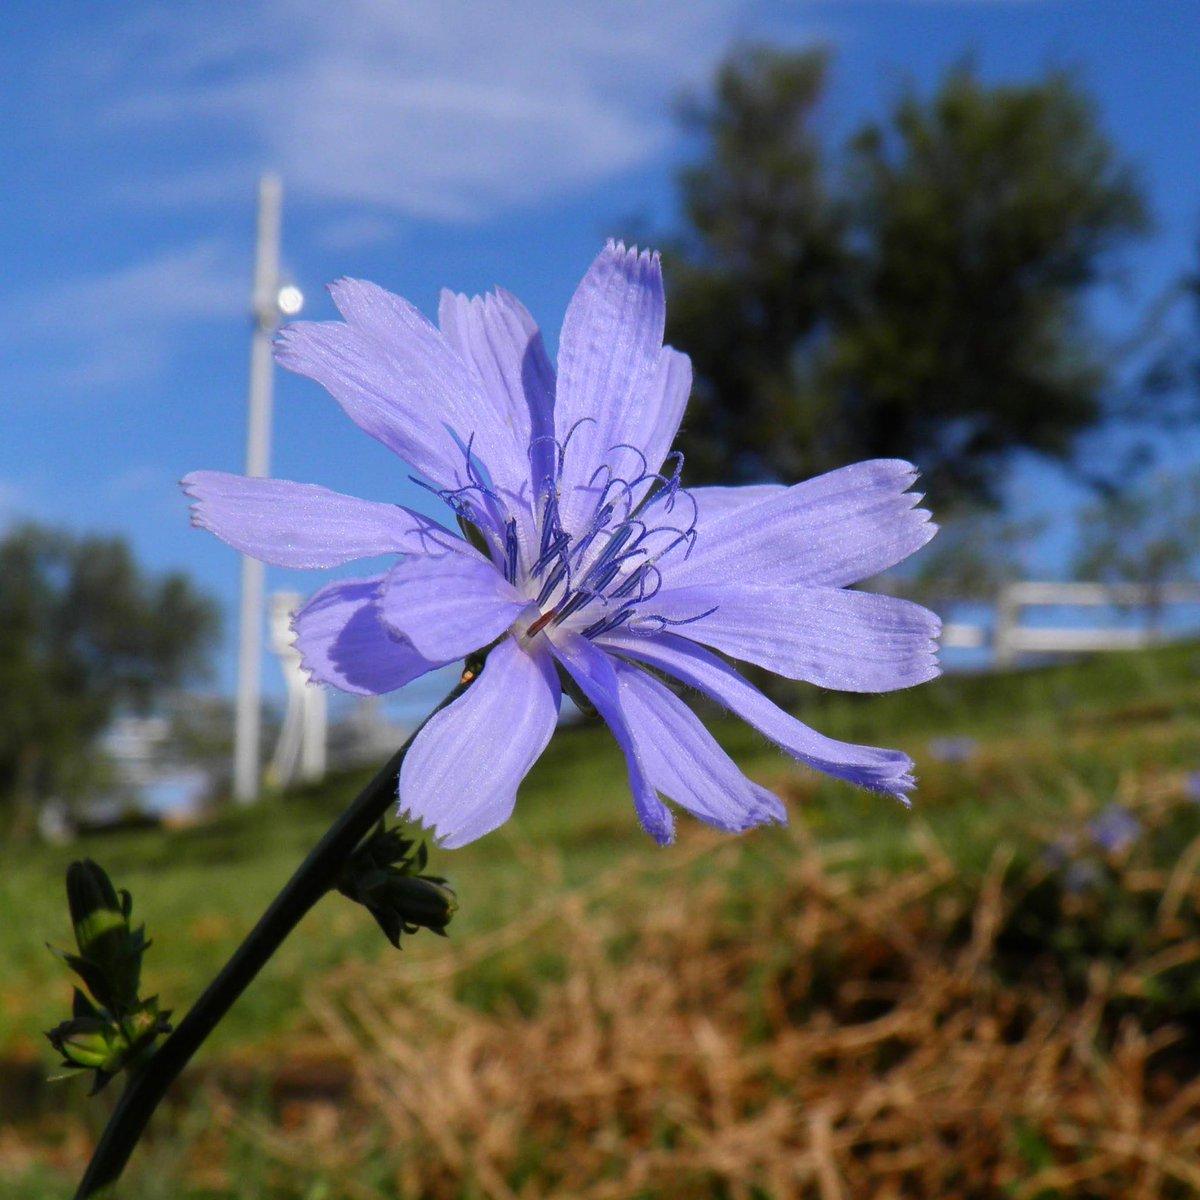 Ale, a disfrutar la imagen y la mañana... #achicoria #buongiorno  #bleu #colours #botany #natural #greennature #azules #naturephotography #flowers_super_pics #flowers #nature #verde #floresilvestres #blue #fotografia  #flores #flower #flor #artphoto  #naturaleza  #azul #azzurri https://t.co/kToaTUc8dz